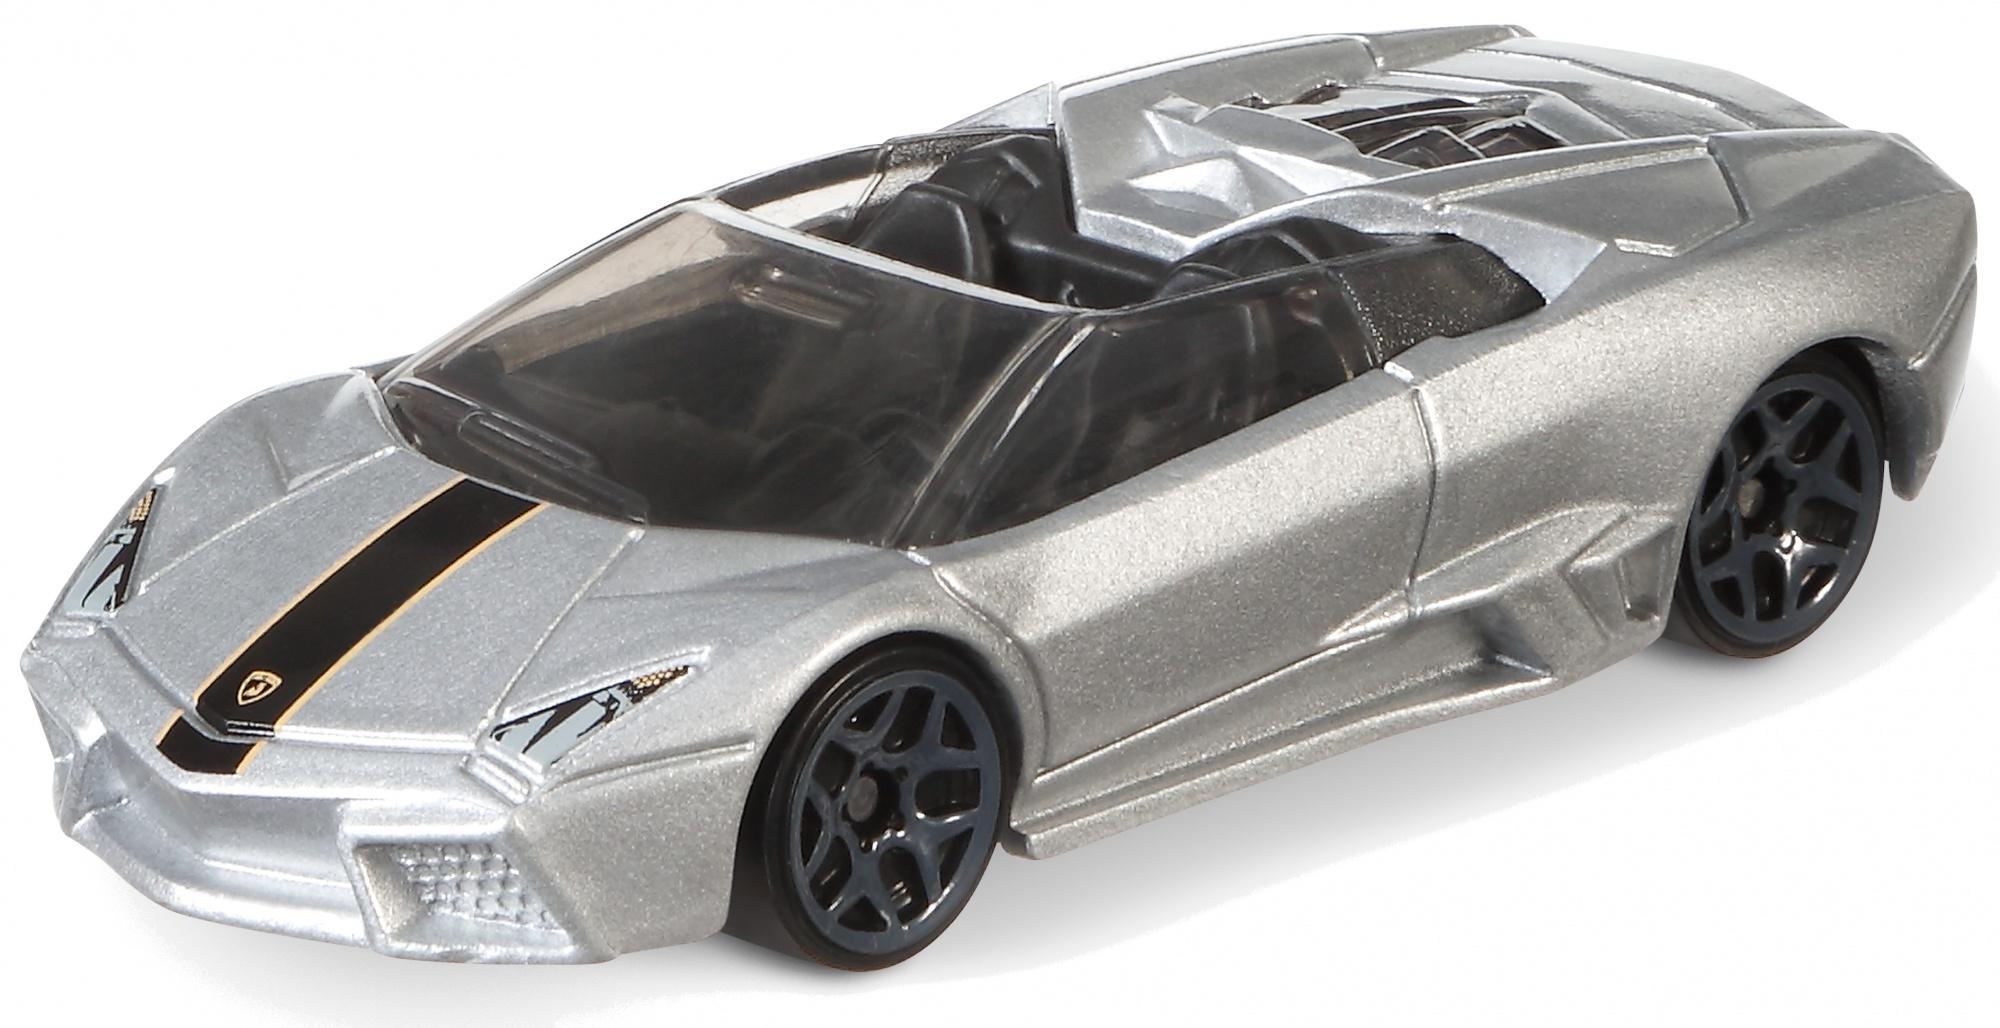 Hot Wheels Sportauto Lamborghini Reventon Grijs 7 Cm Internet Toys